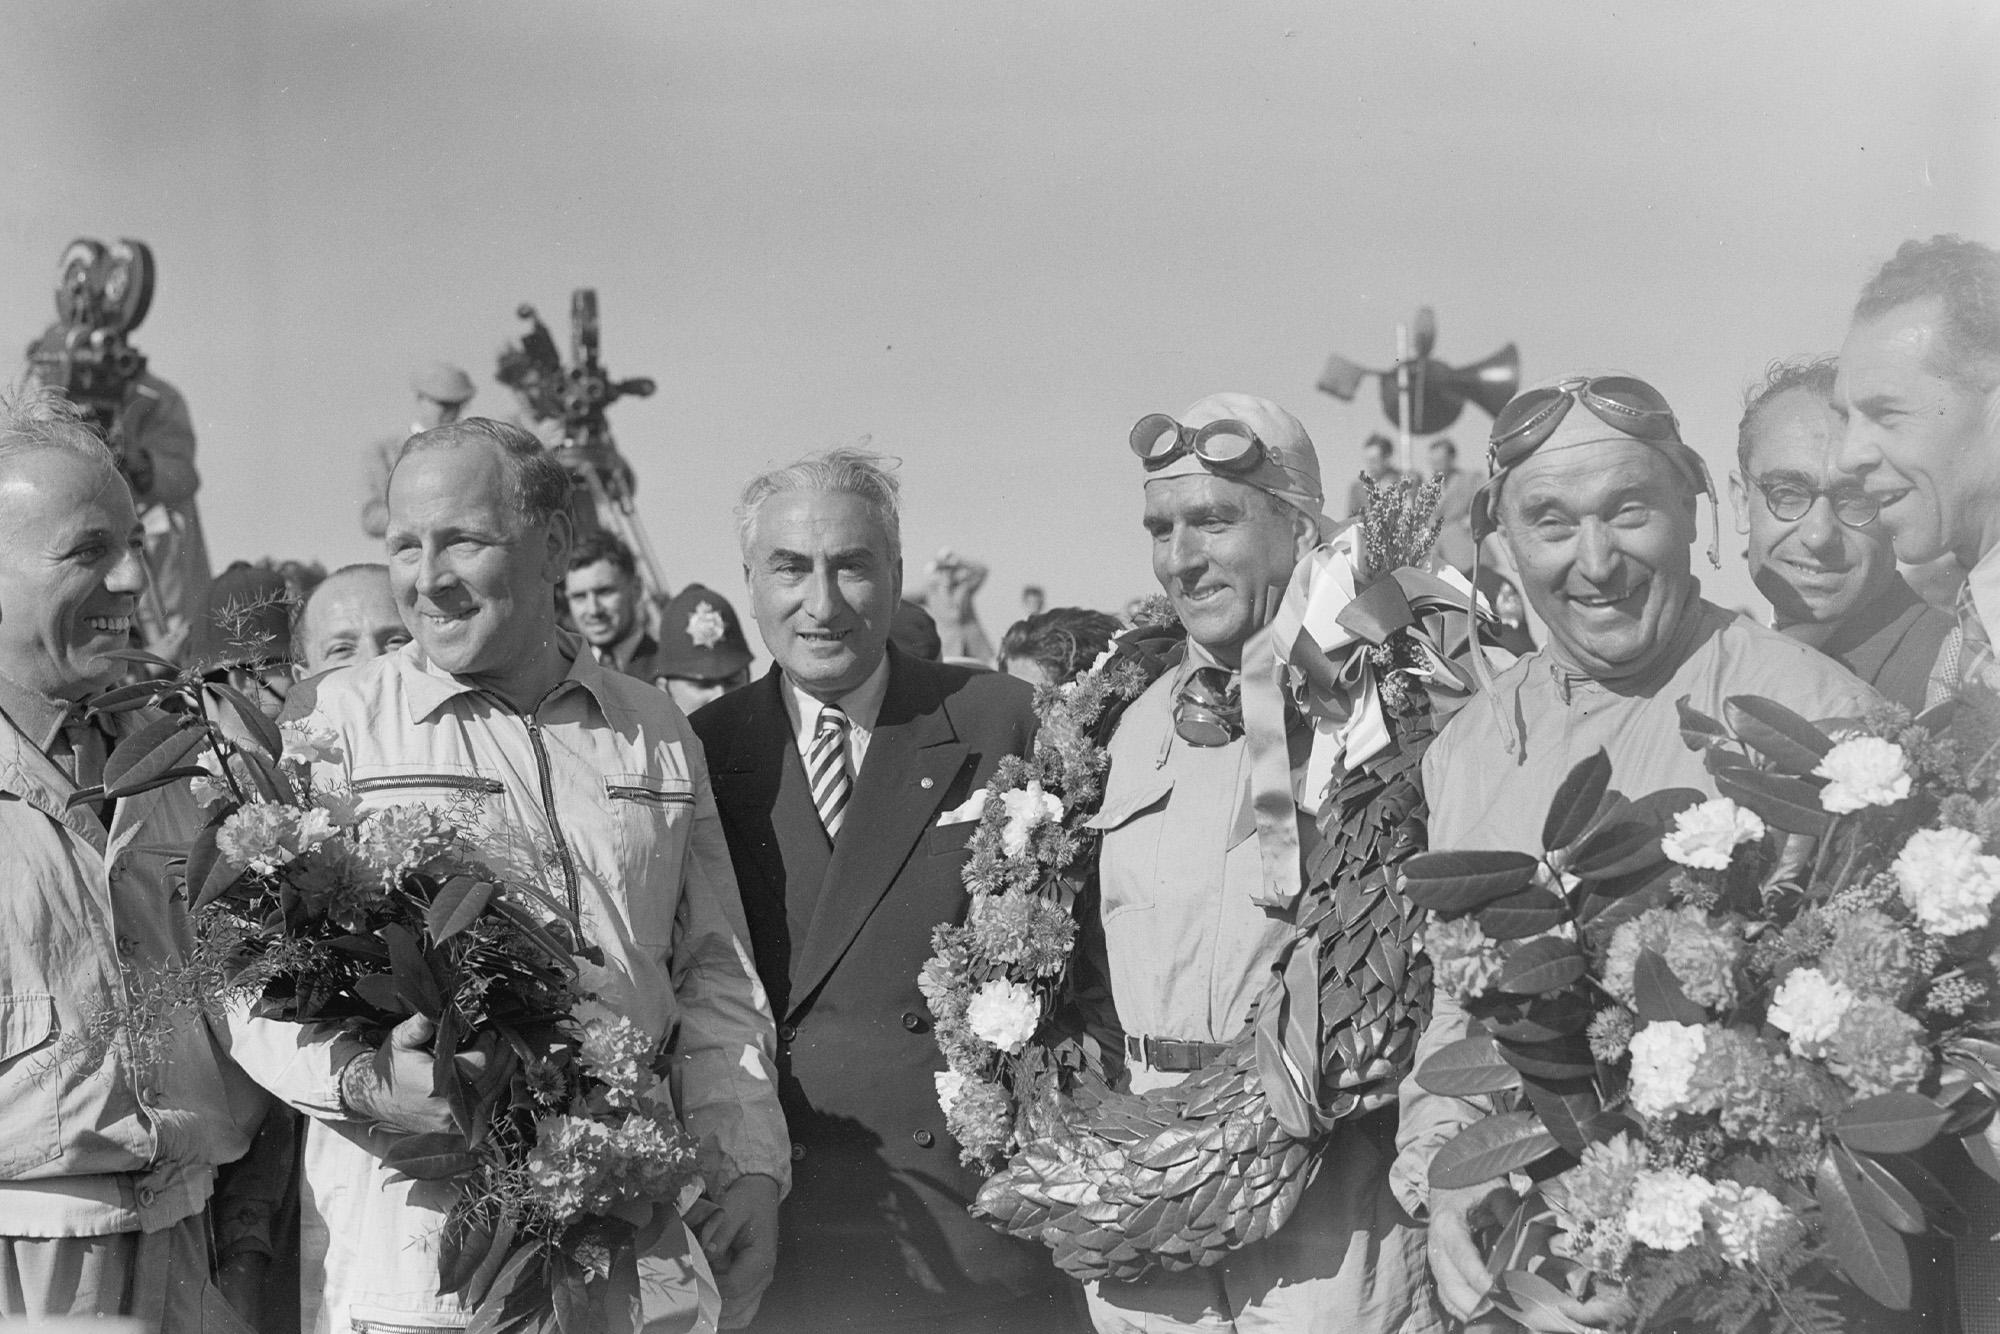 Reg Parnell, Giuseppe Farina and Luigi Fagioli - the winning ALfa Romeo team - after the 1950 British Grand Prix at Silverstone